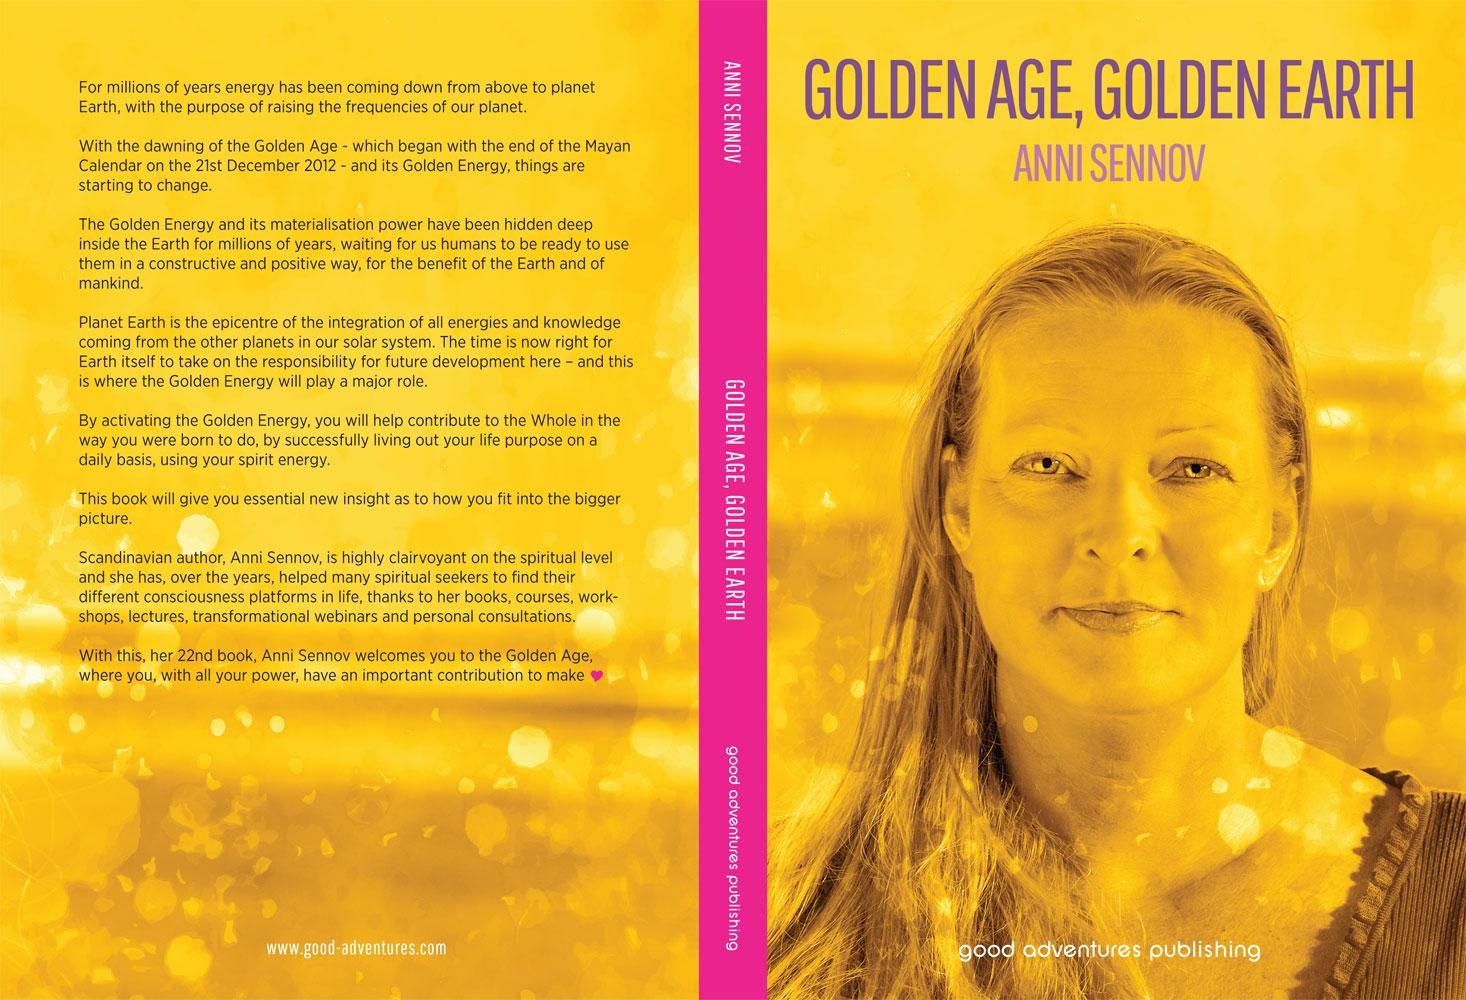 Golden Age, Golden Earth